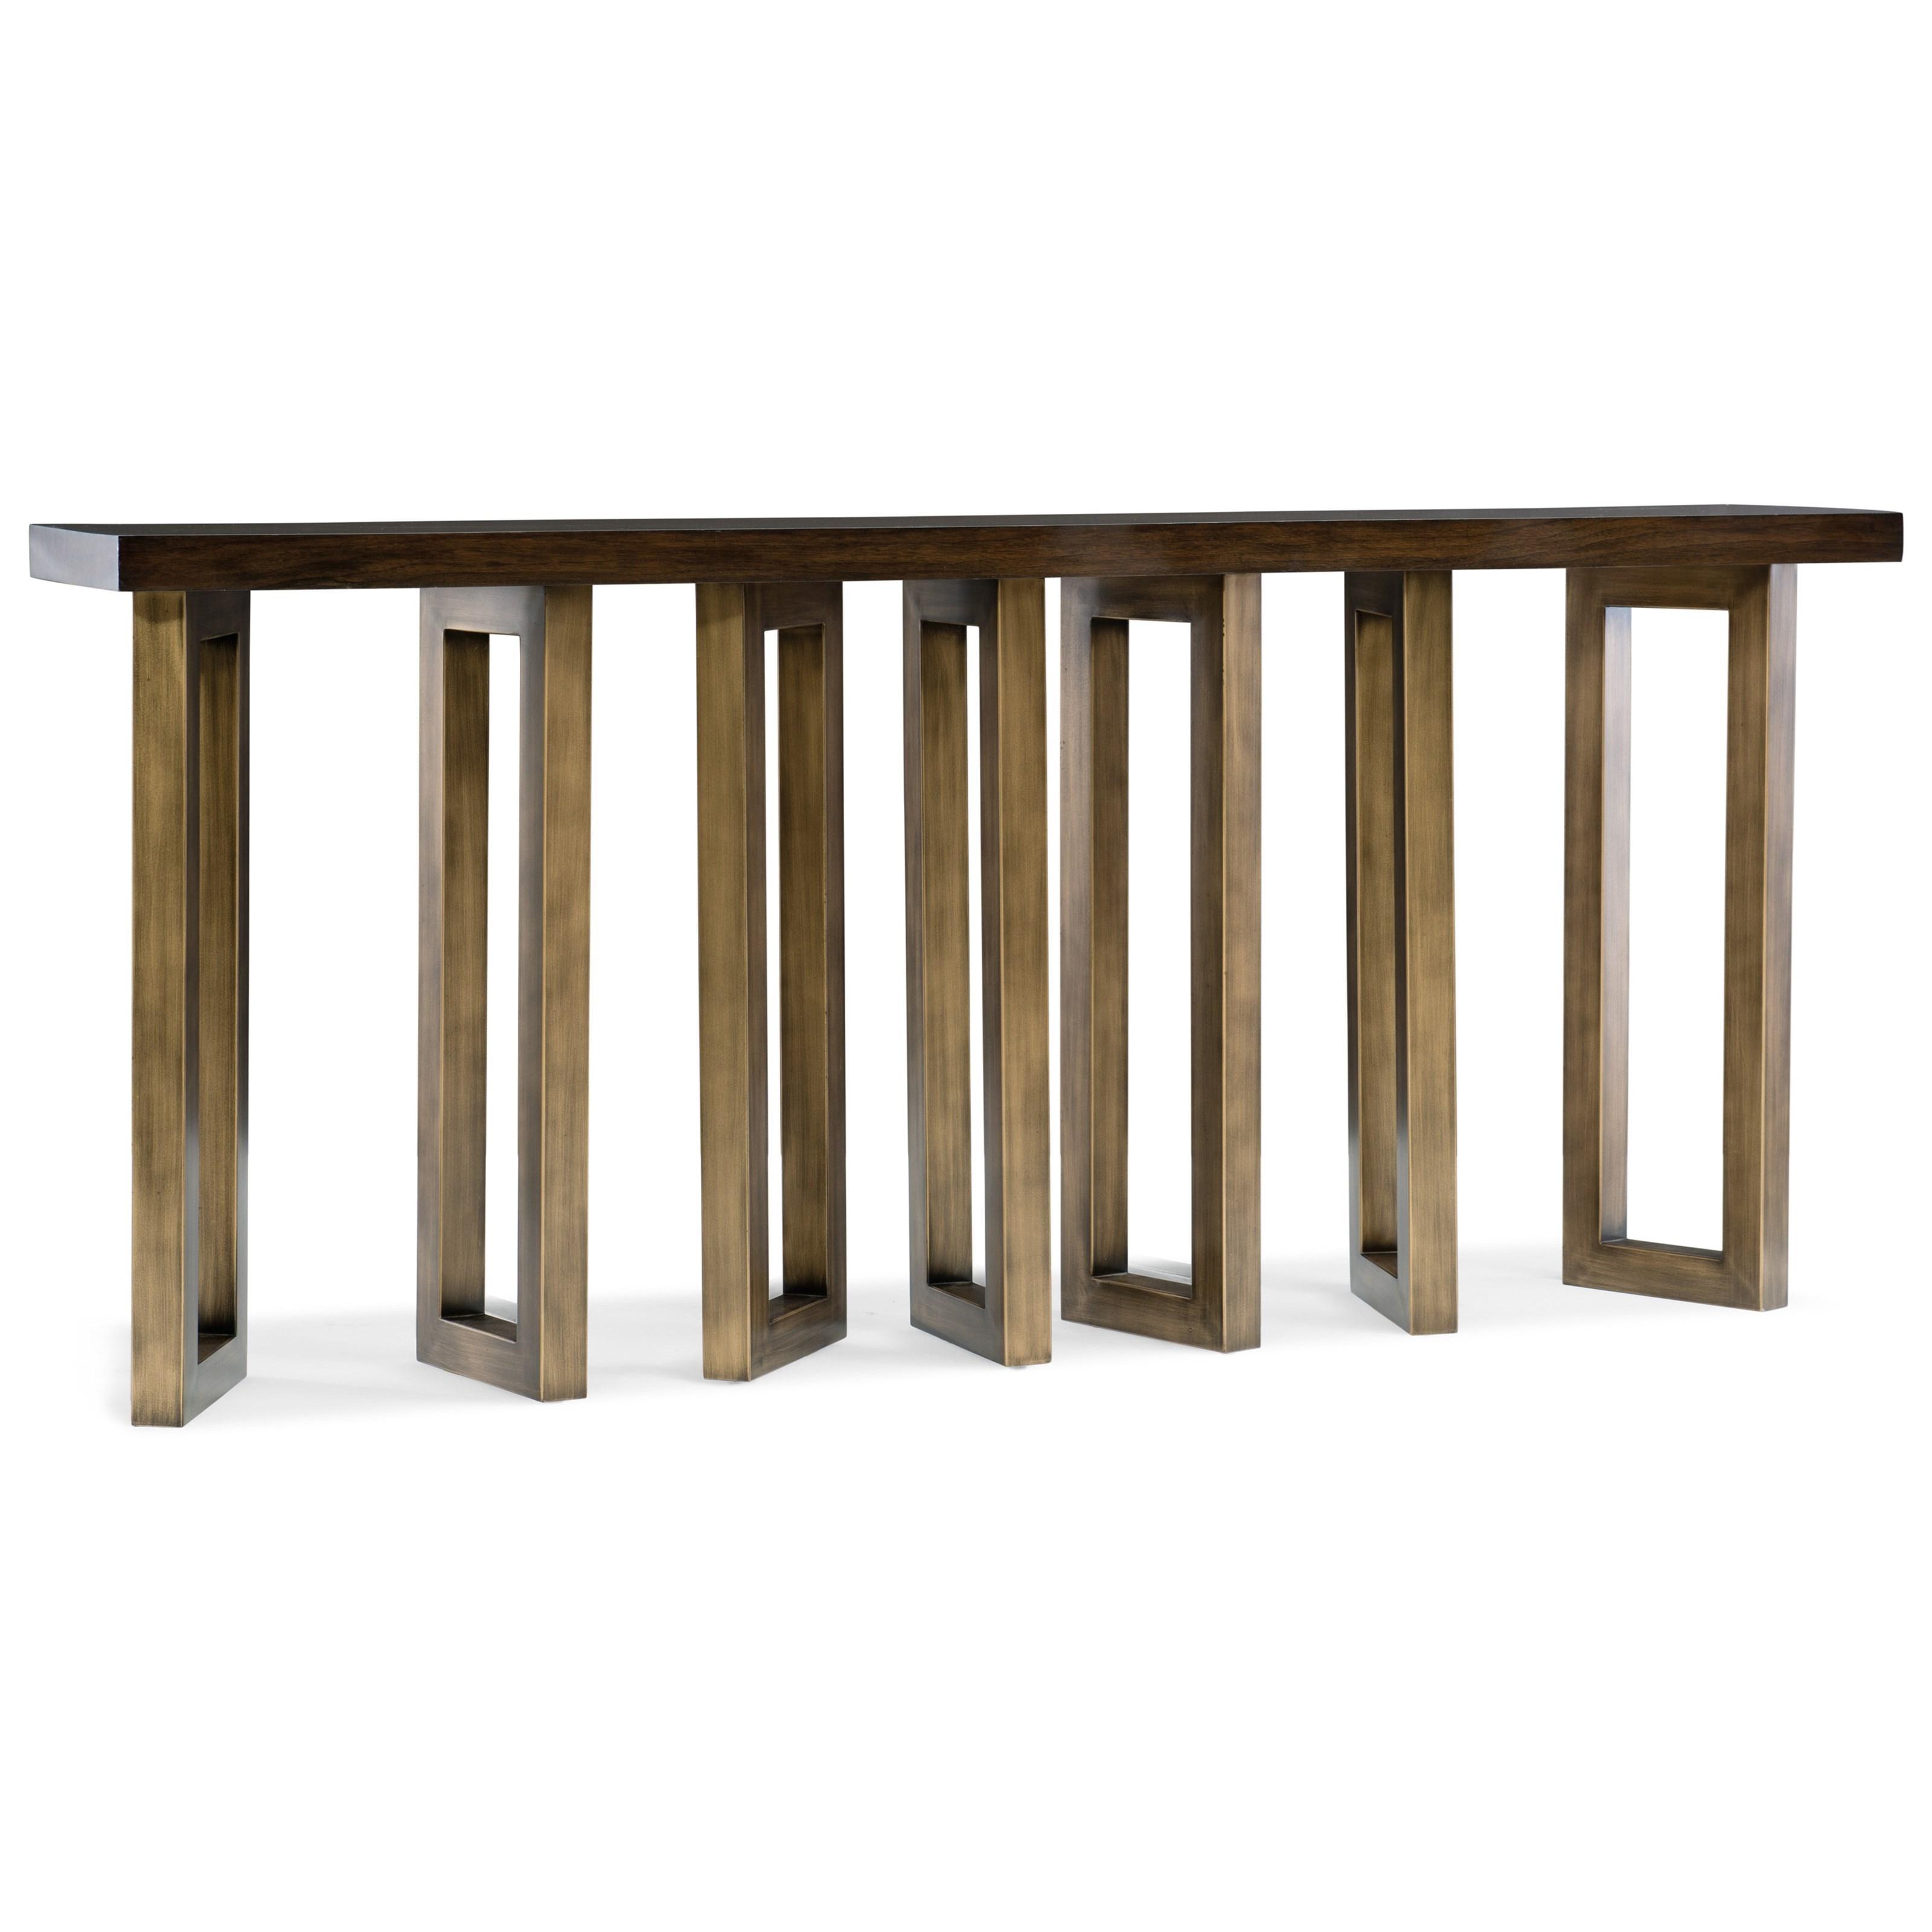 Hooker Furniture Melange 638 85287 Dkw Connelly Contemporary